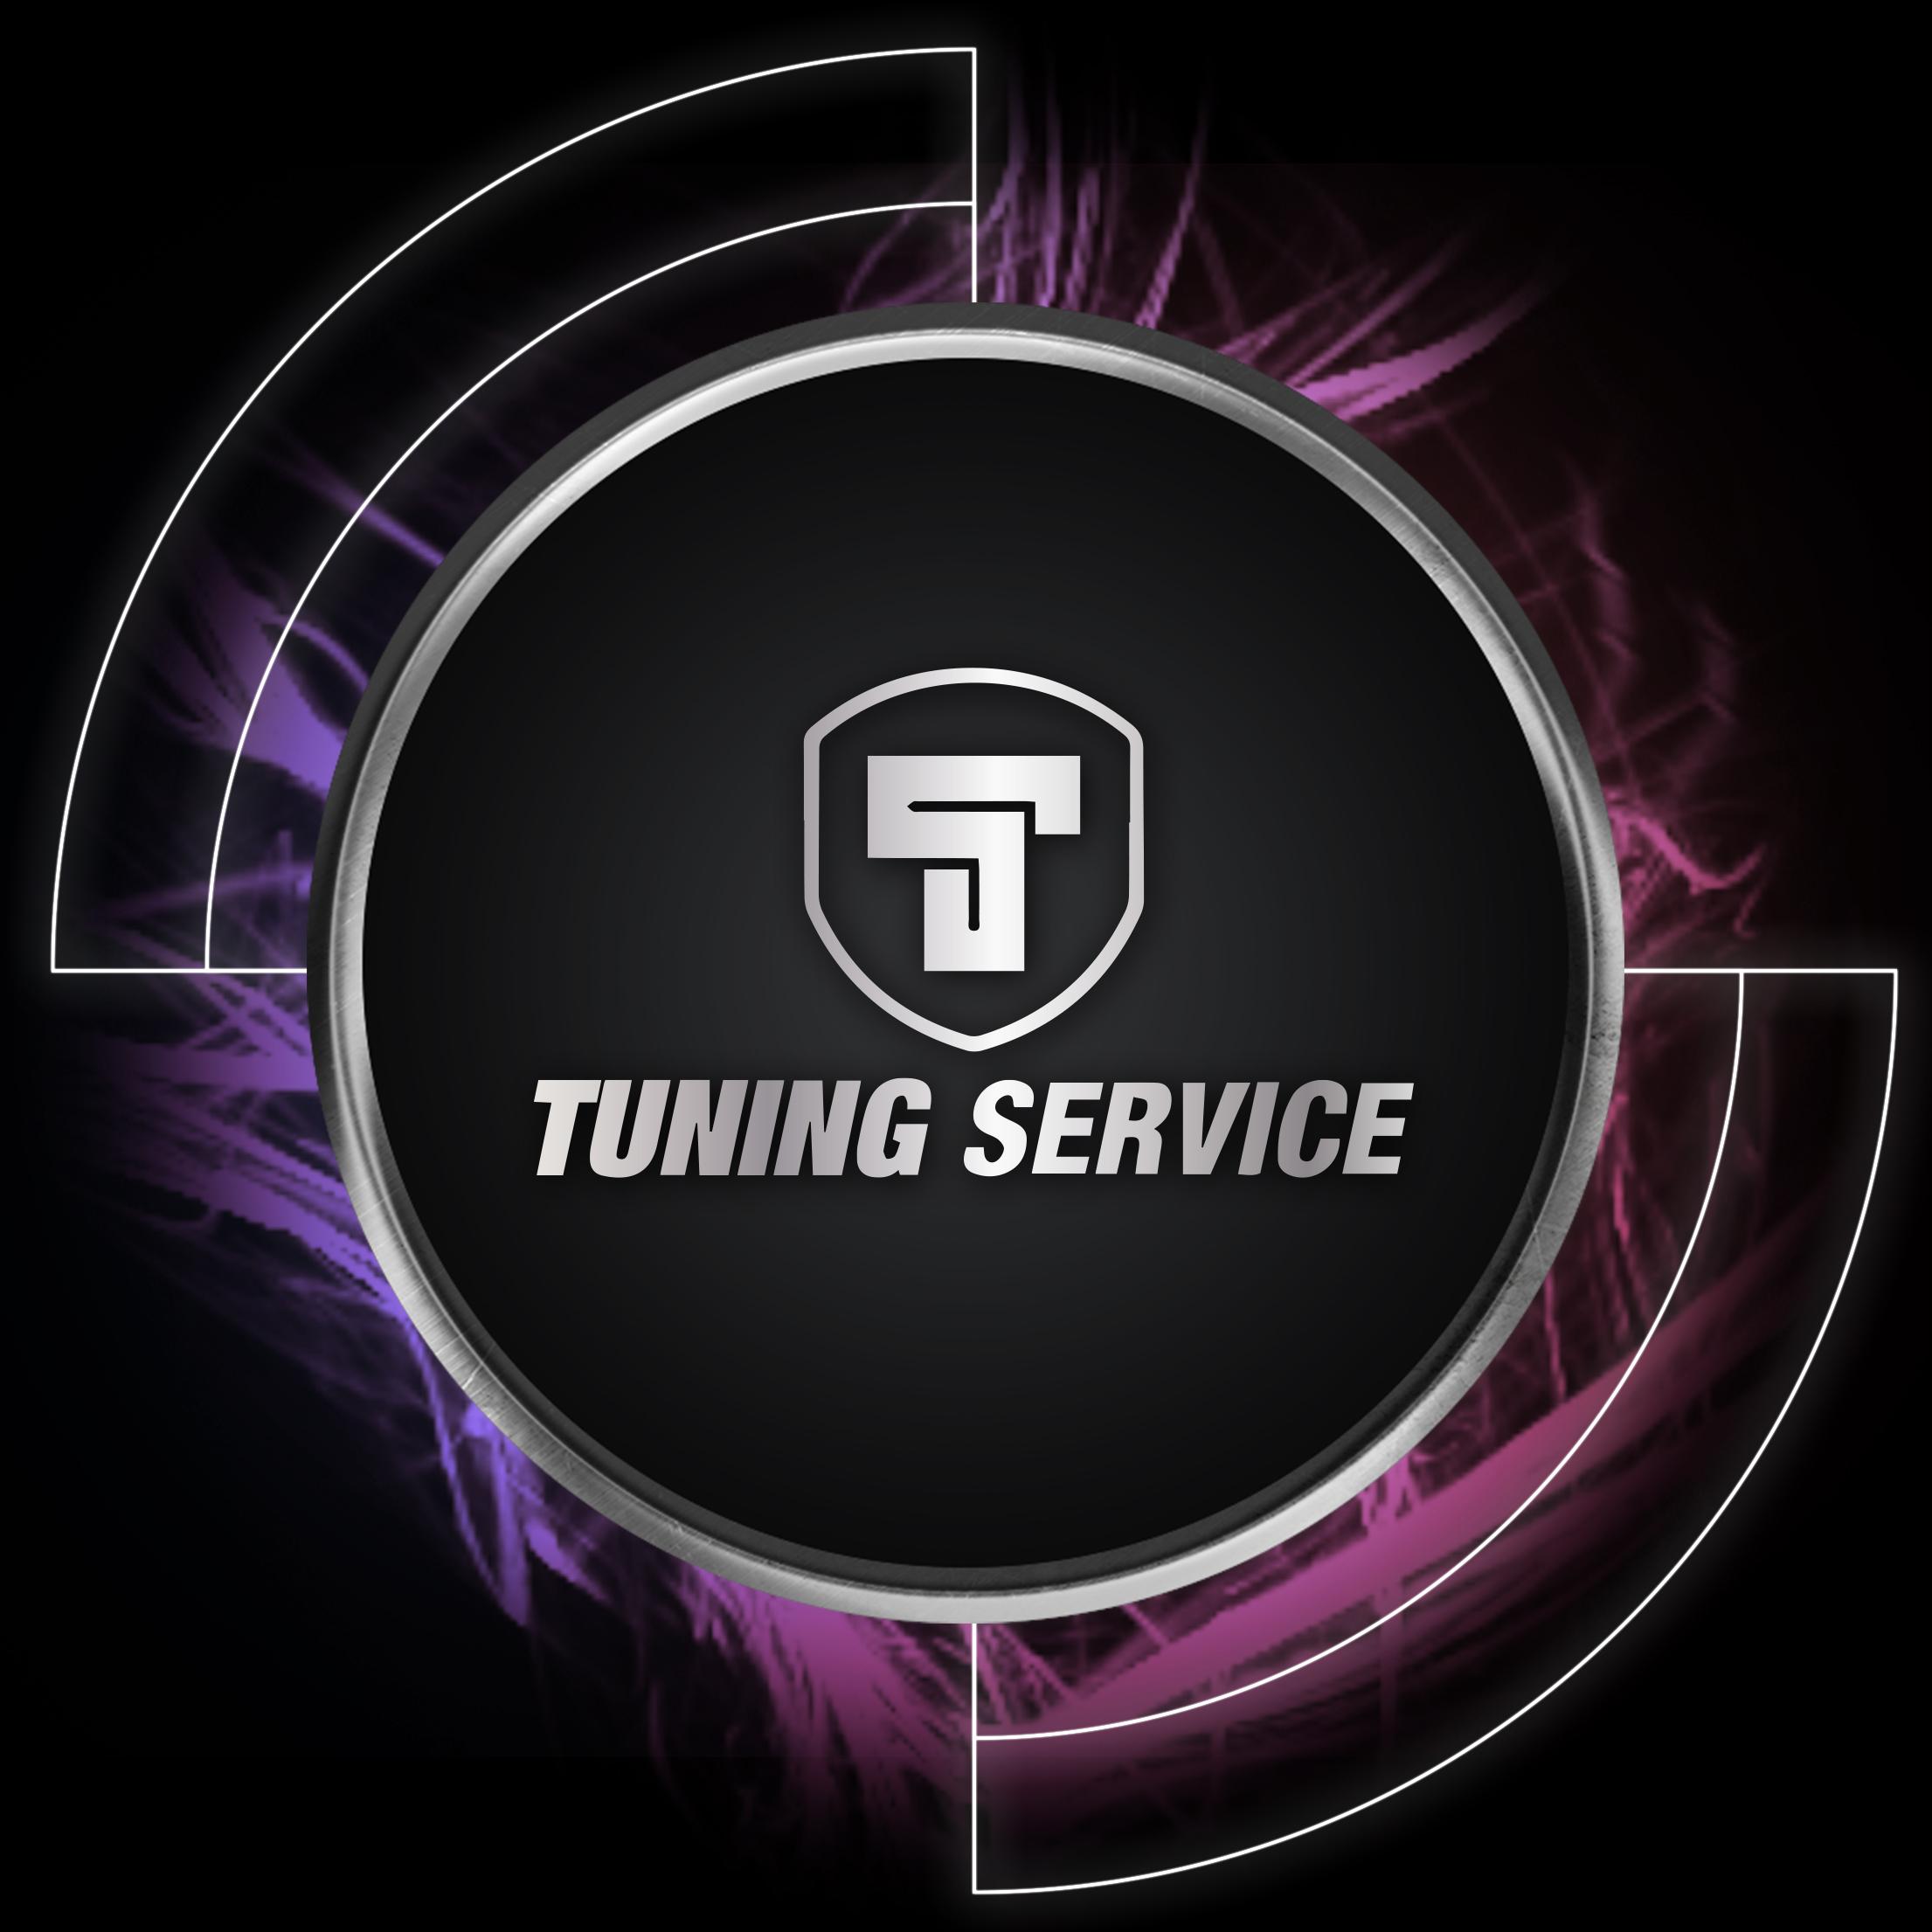 Tuning Service